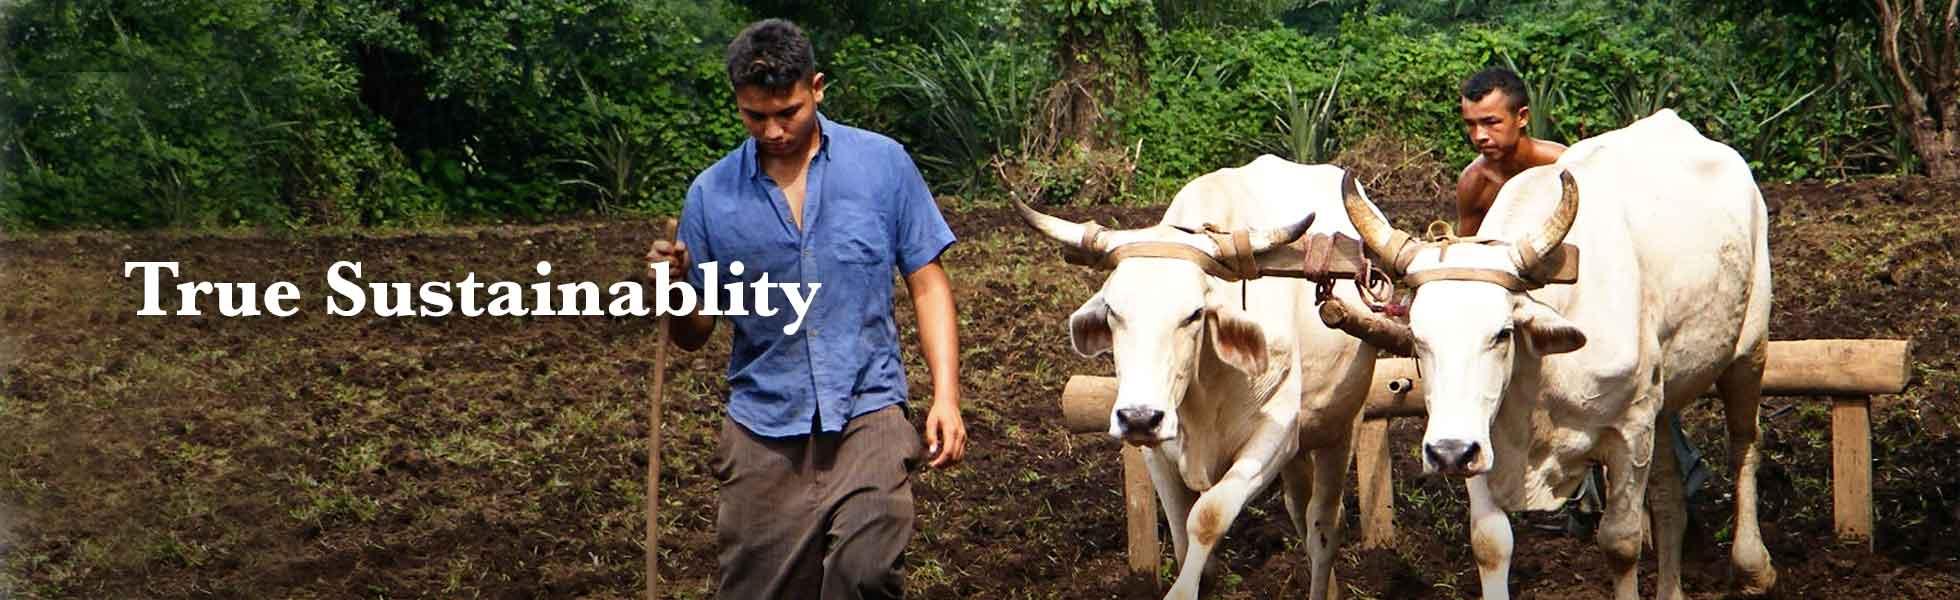 maggies-organics-sustainability-process-2.jpg